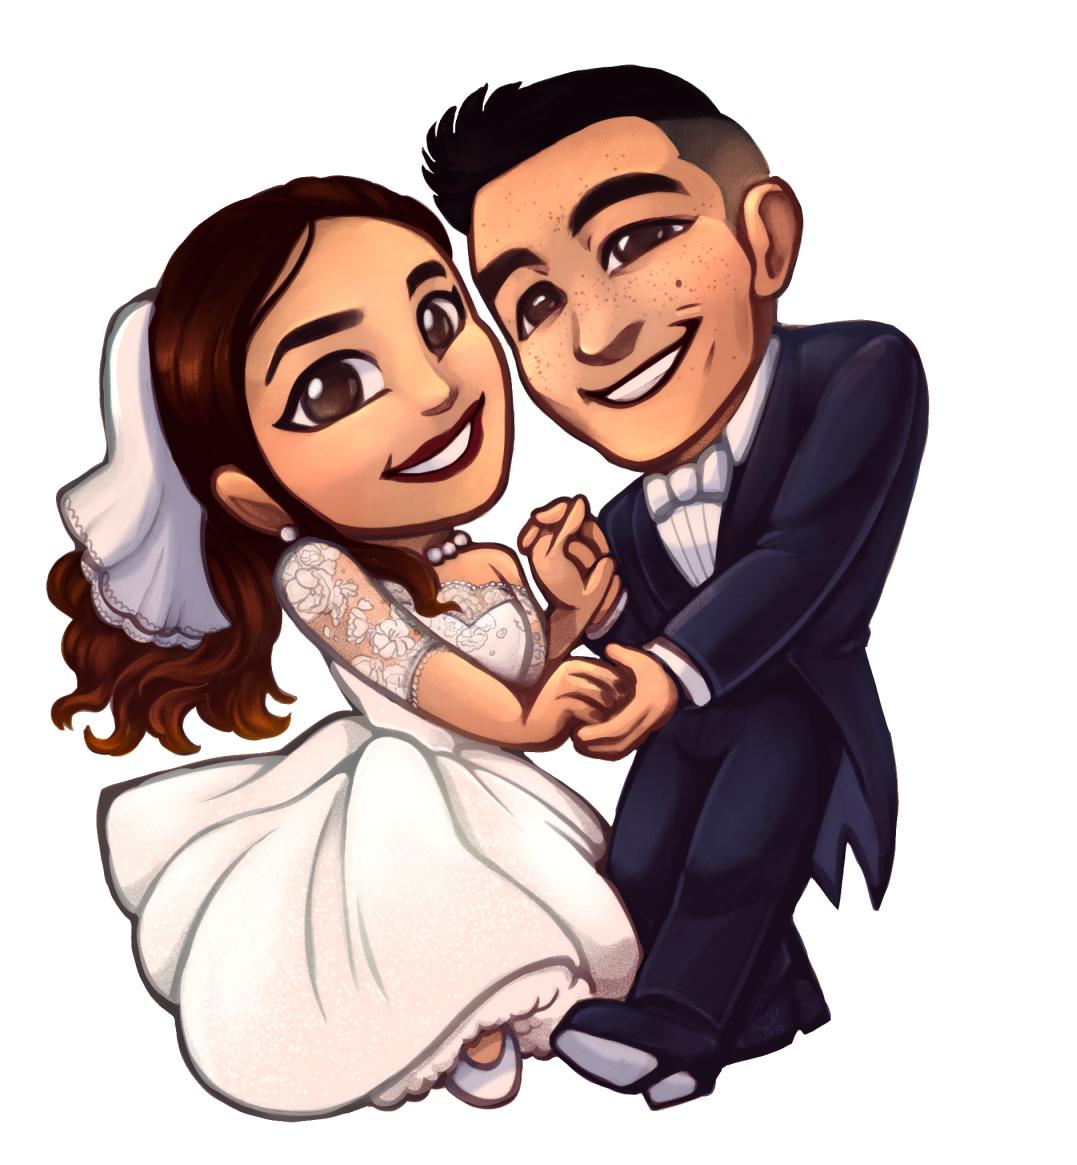 OriginalGshow_Chibi_Wedding_Commission.png